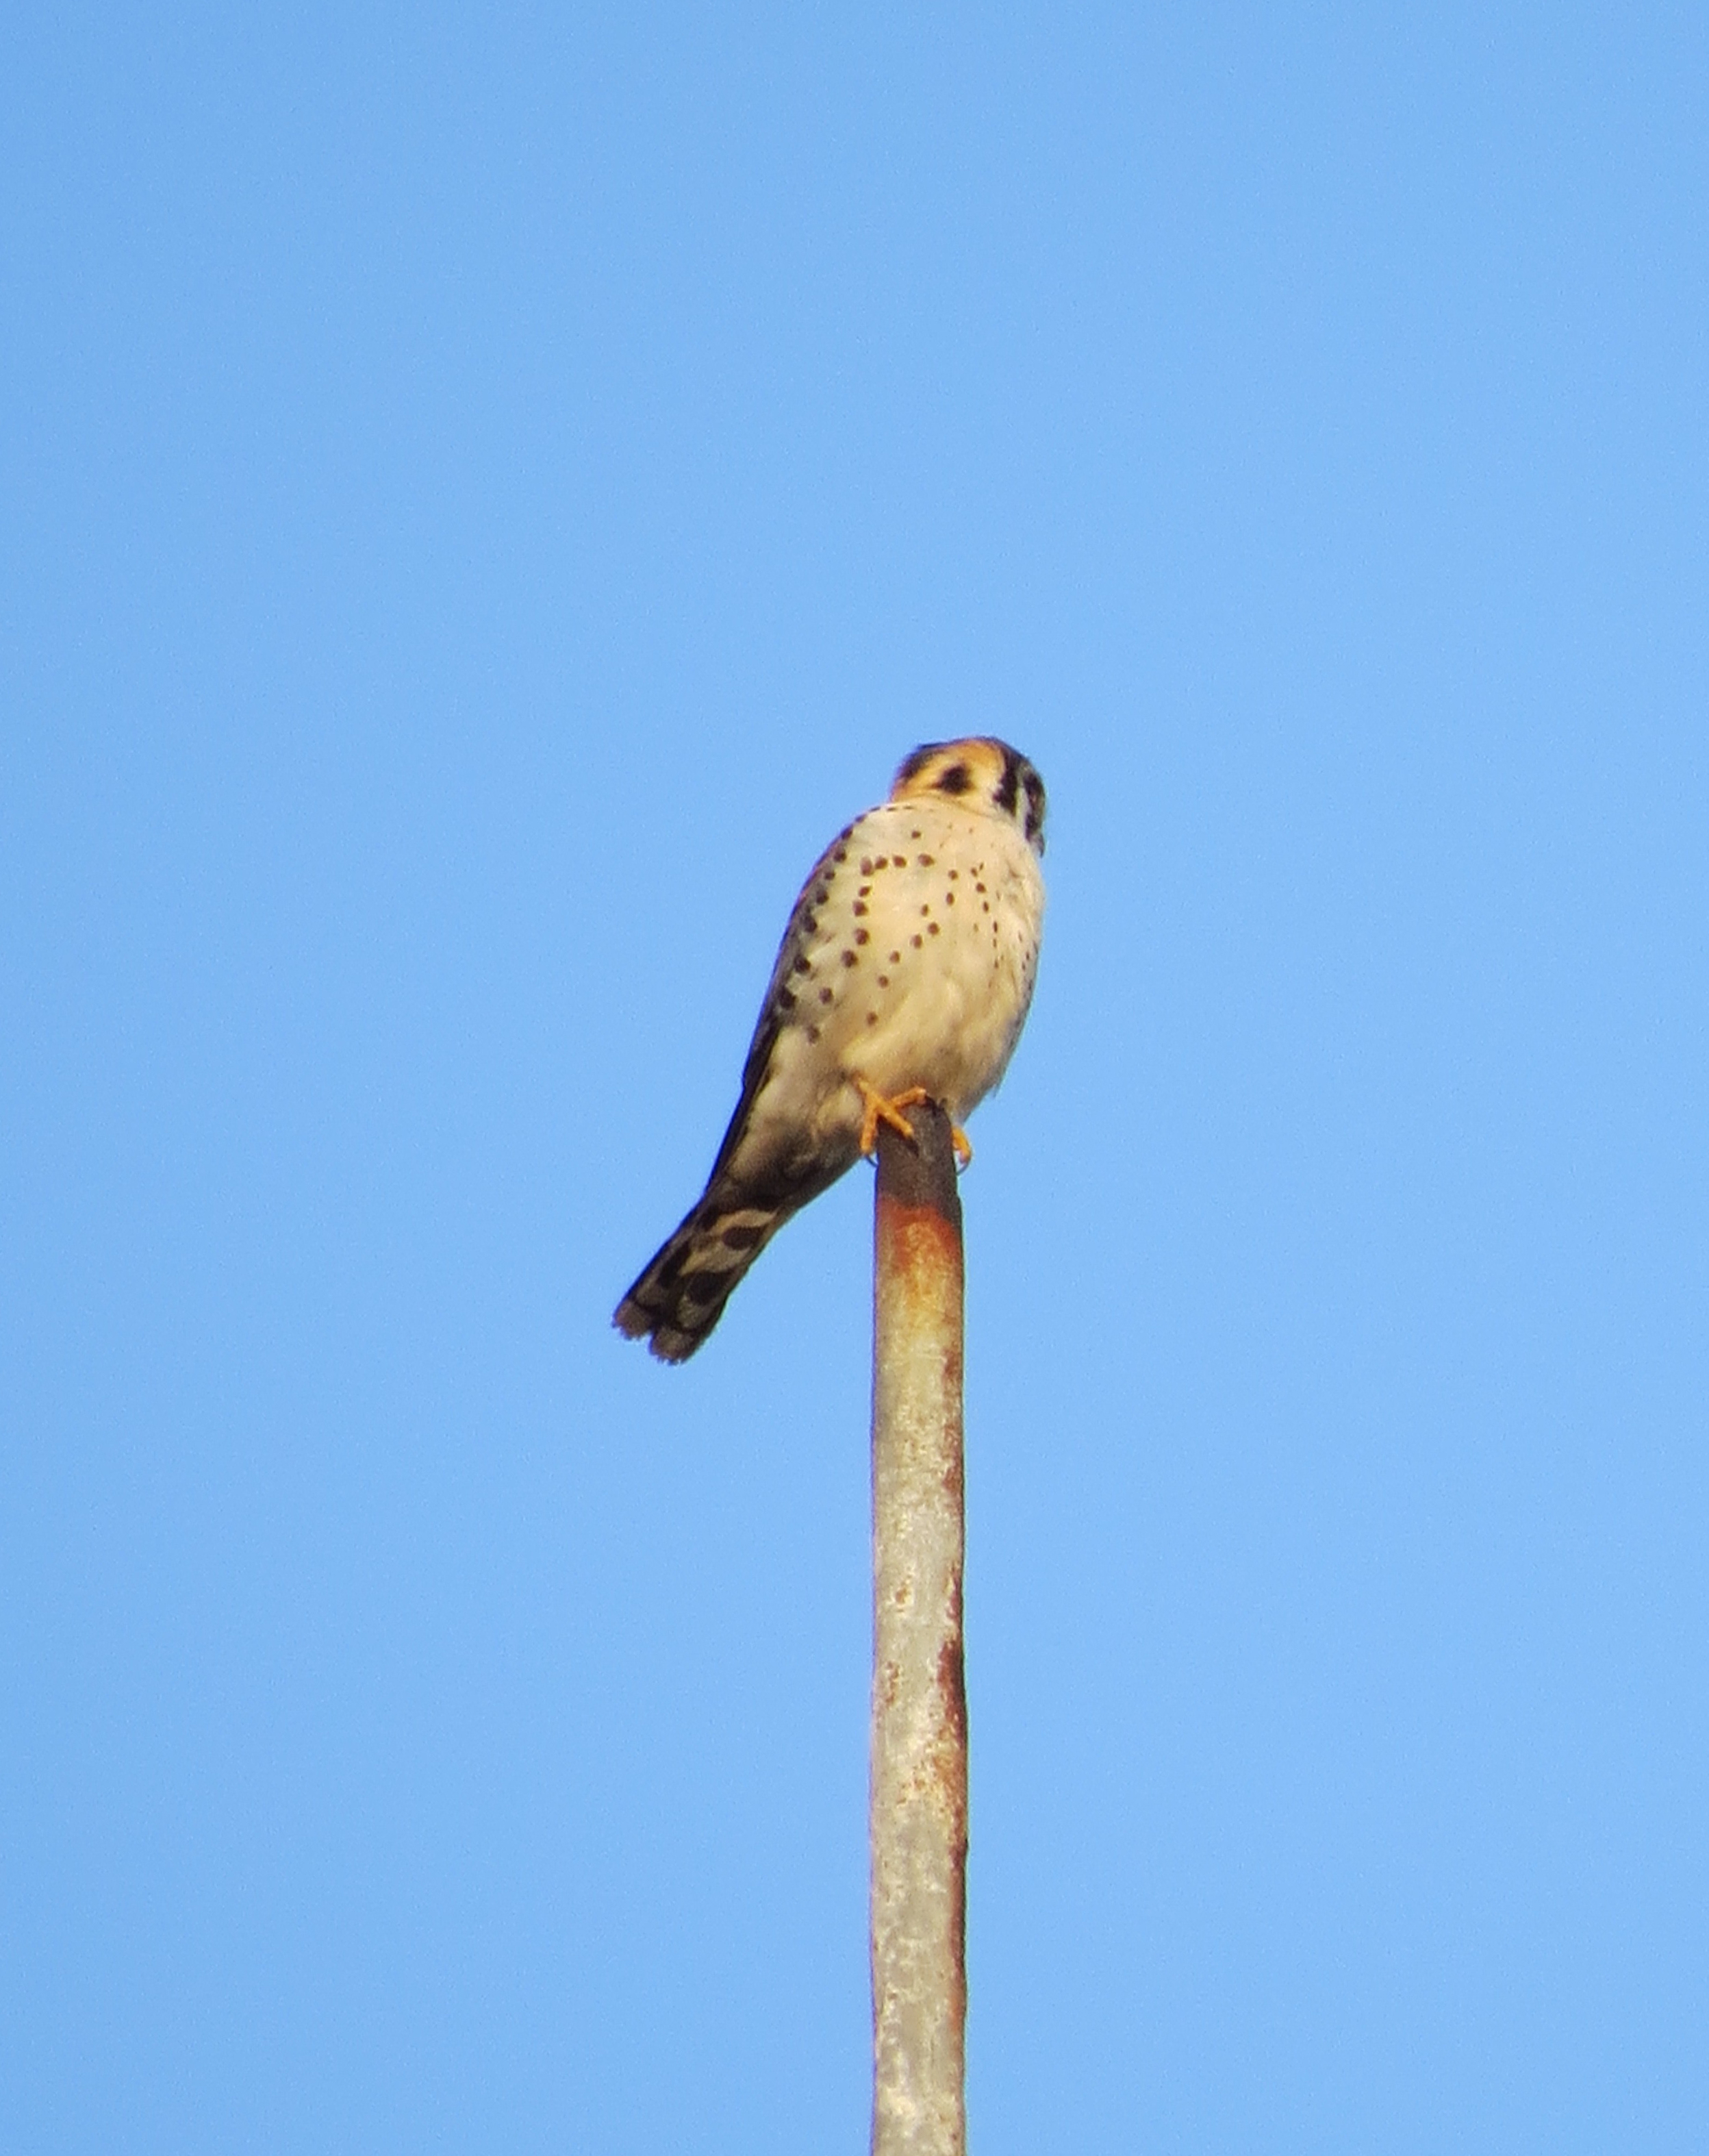 Owl on Church Steeple, Brooklyn, NY